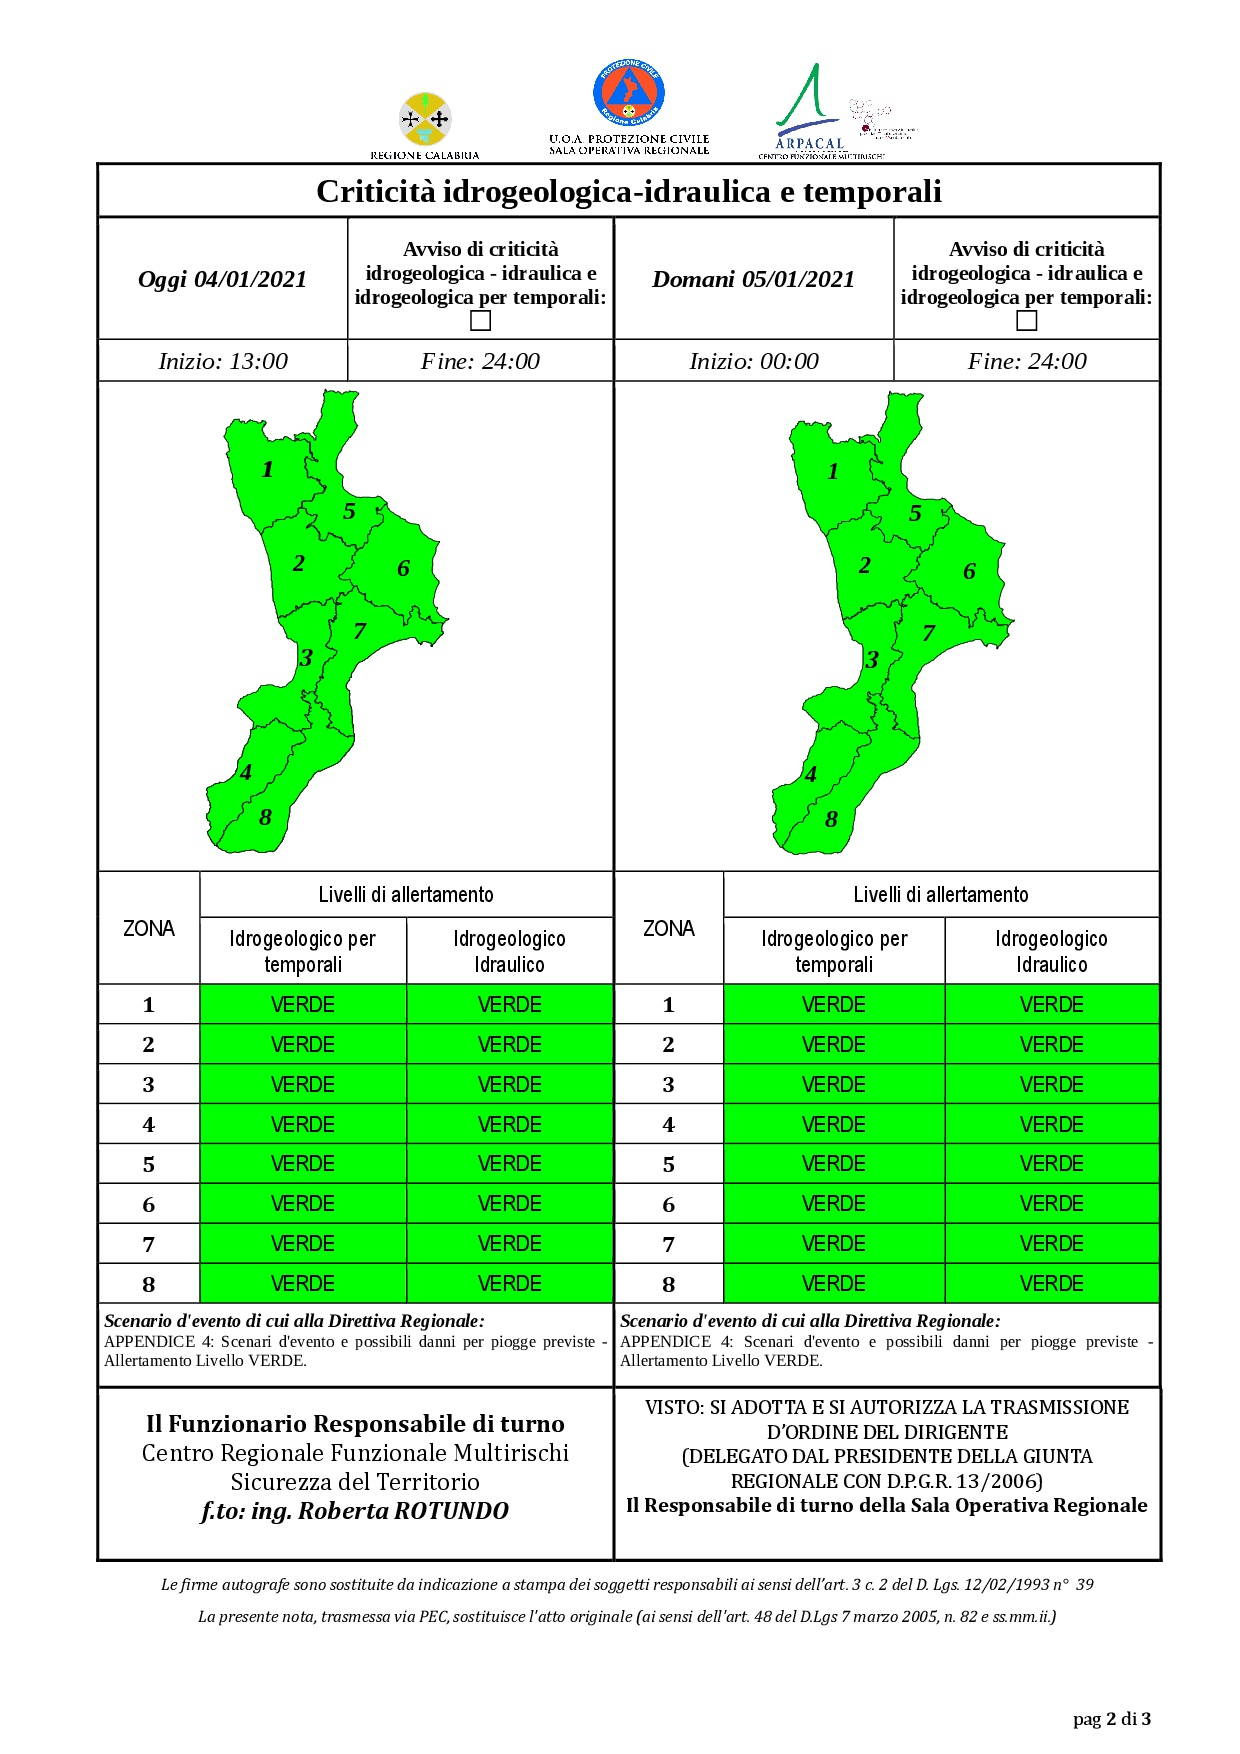 Criticità idrogeologica-idraulica e temporali in Calabria 04-01-2021